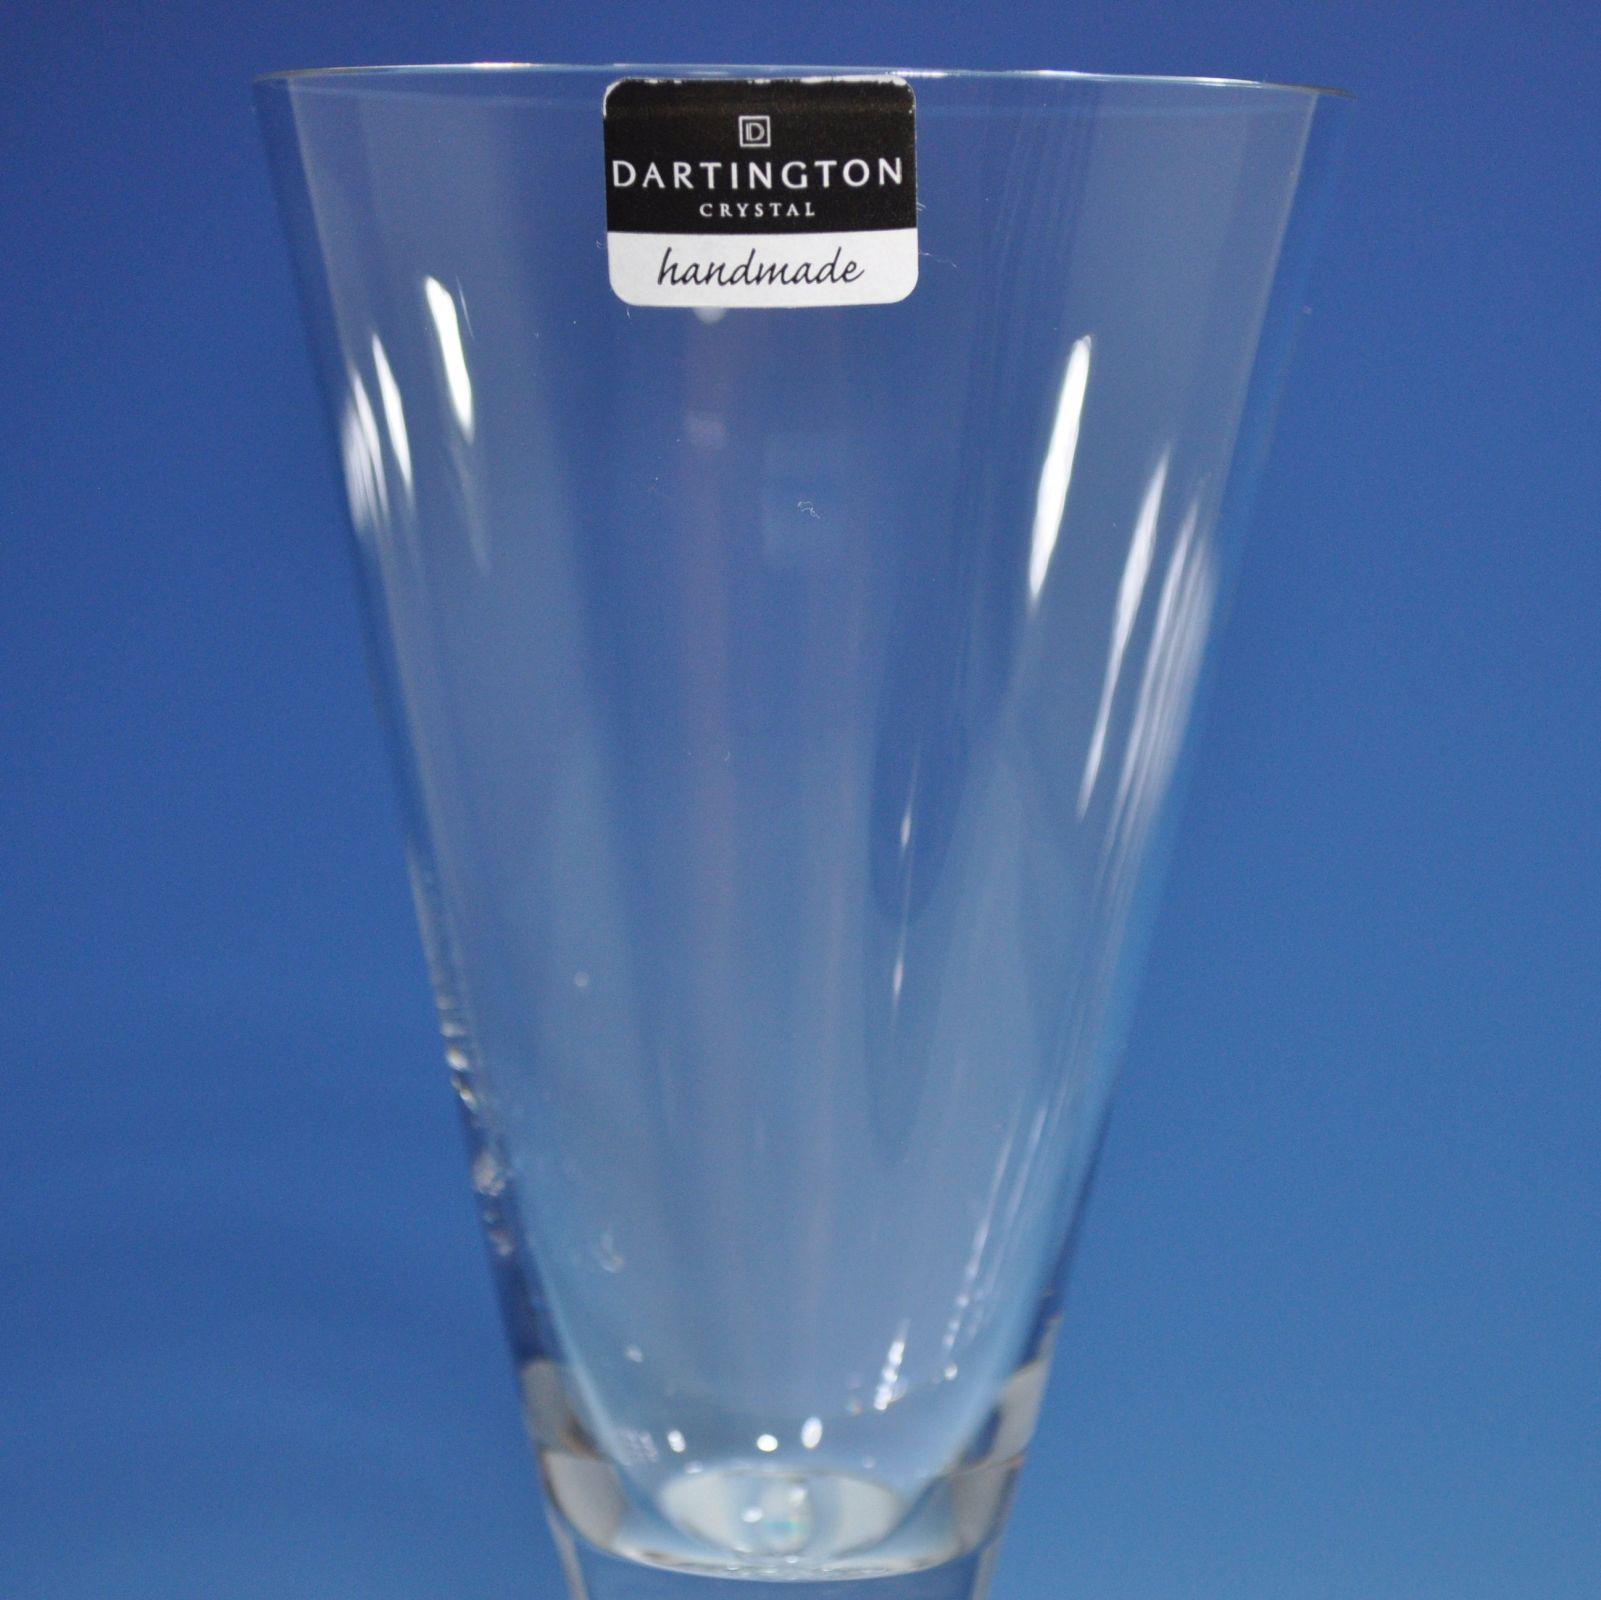 Dartington crystal product categories michael virden glass dartington crystal sharon wine glass pair reviewsmspy